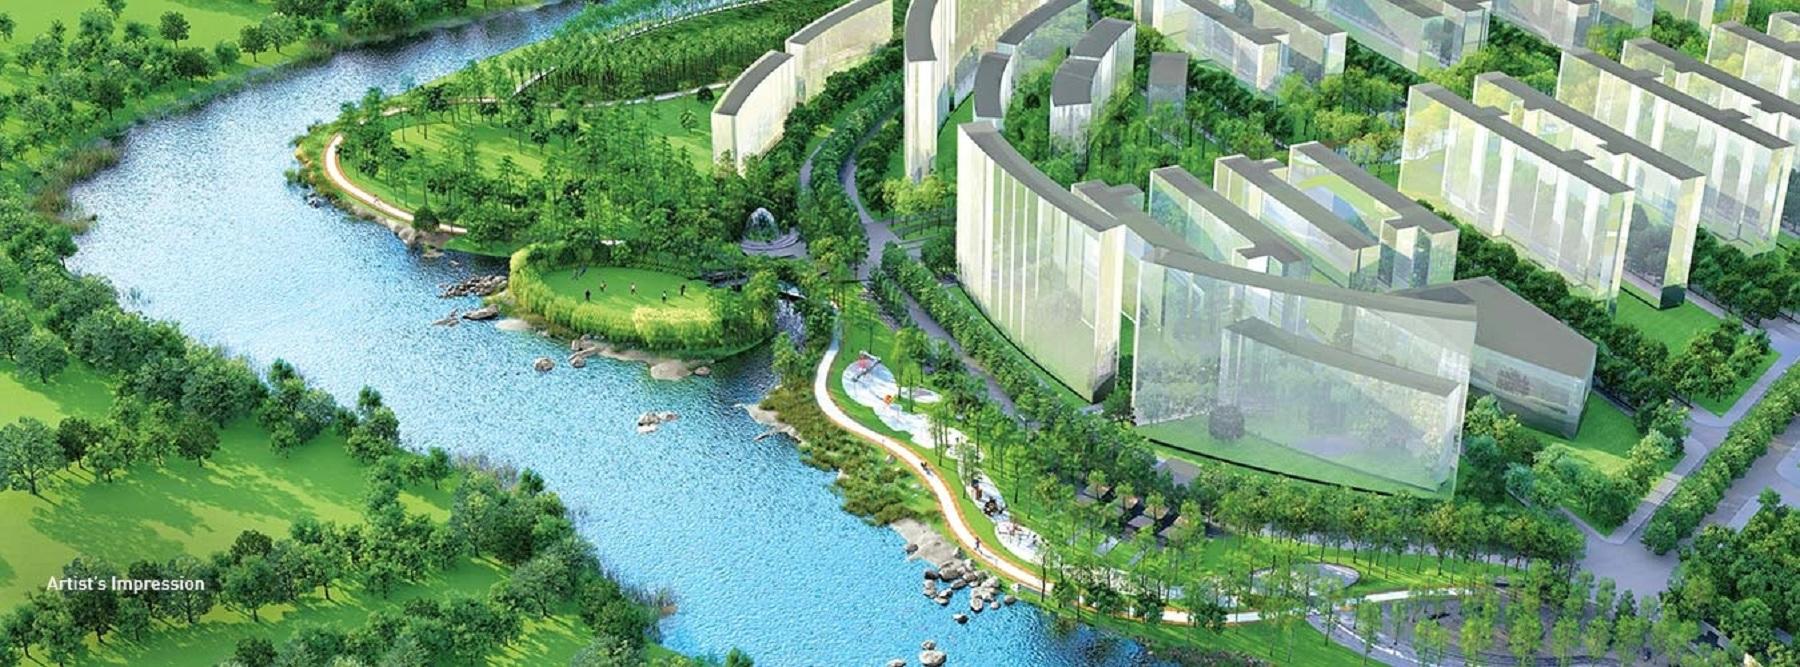 lodha palava aquaville series marvella b c d e f g project amenities features10